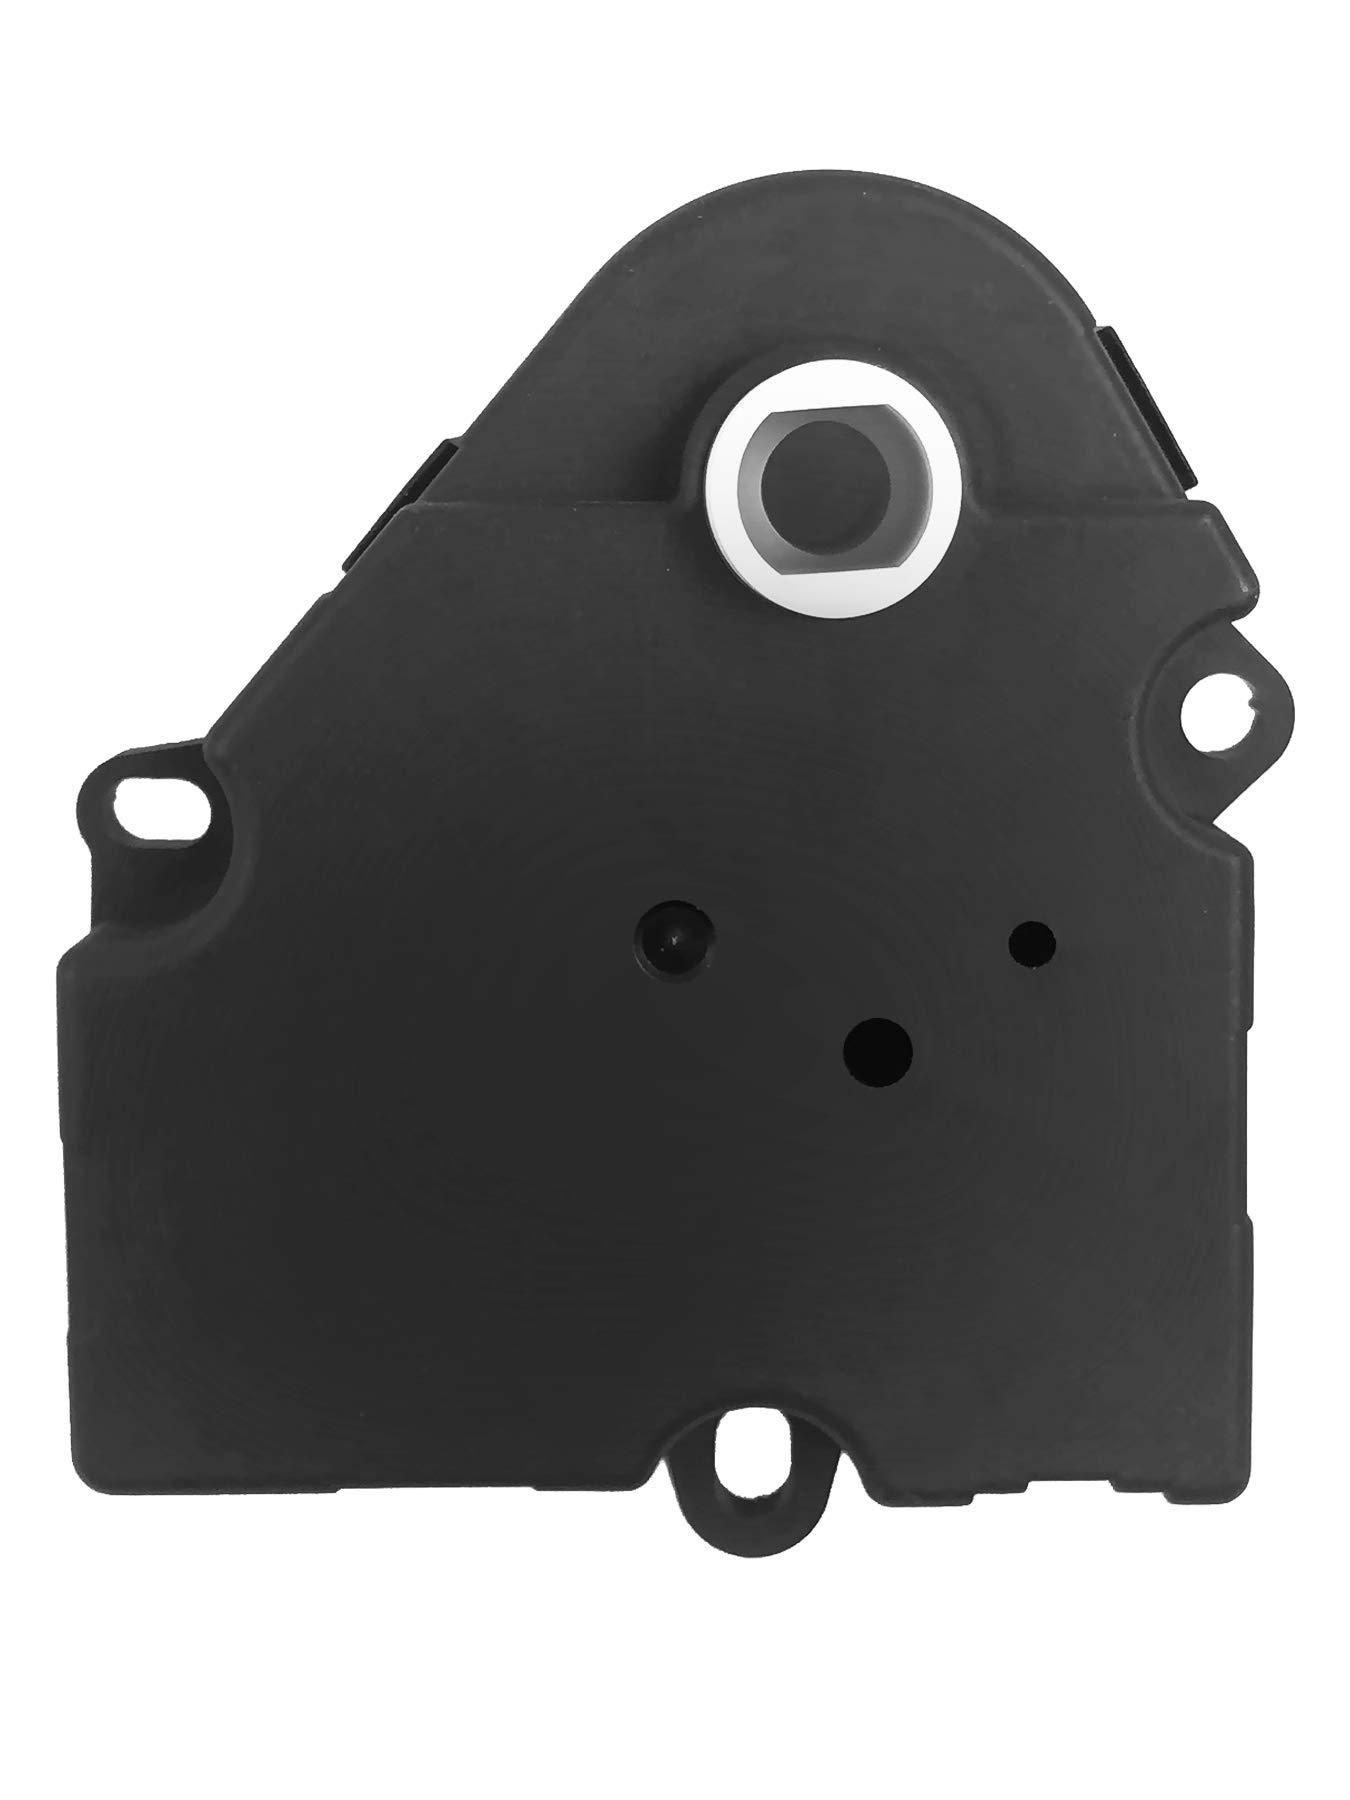 15-72972 Trailblazer Cadillac Escalade 16164972 LCWRGS Chevy Suburban 604-111 AC Rear Blend Door Actuator for Chevy Tahoe GMC Yukon Replace# 52402611 89018375 Buick LeSabre